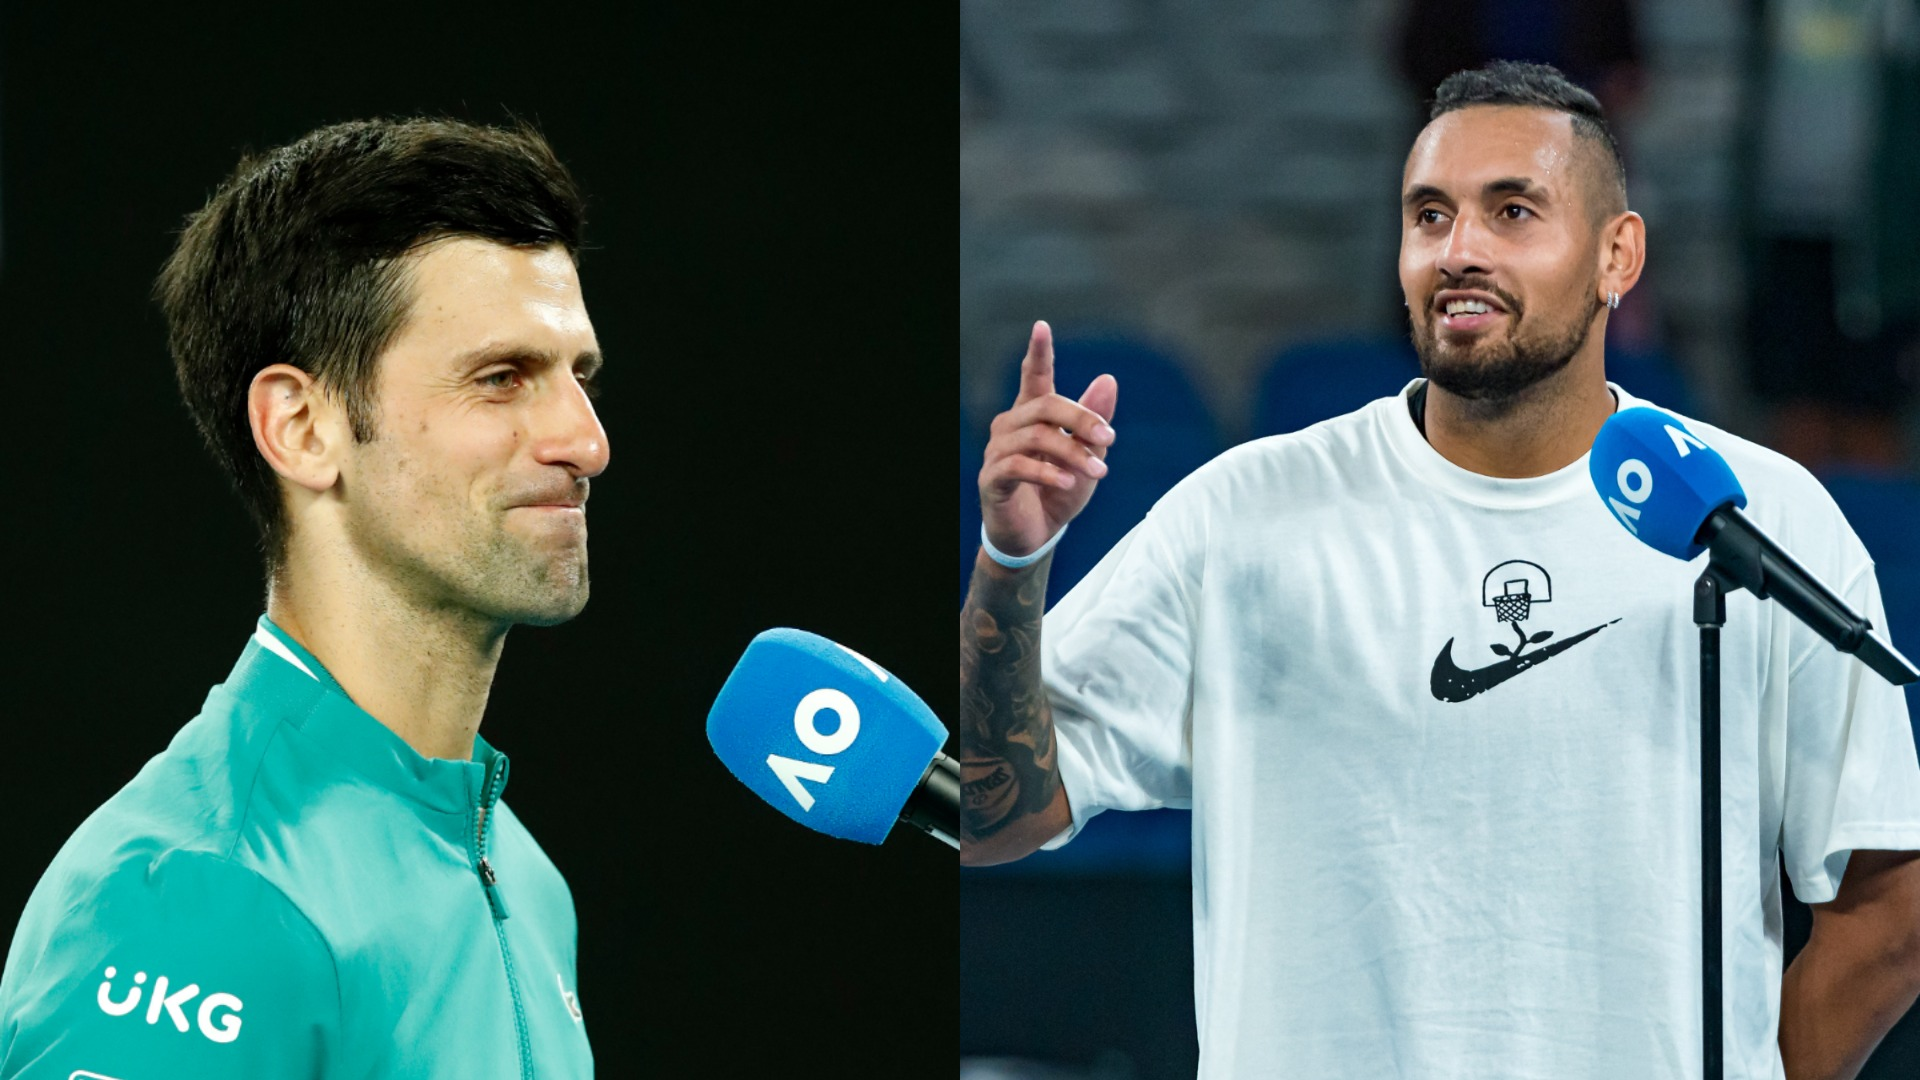 Australian Open: Kyrgios brands Djokovic 'a strange cat', emotional Monfils eliminated